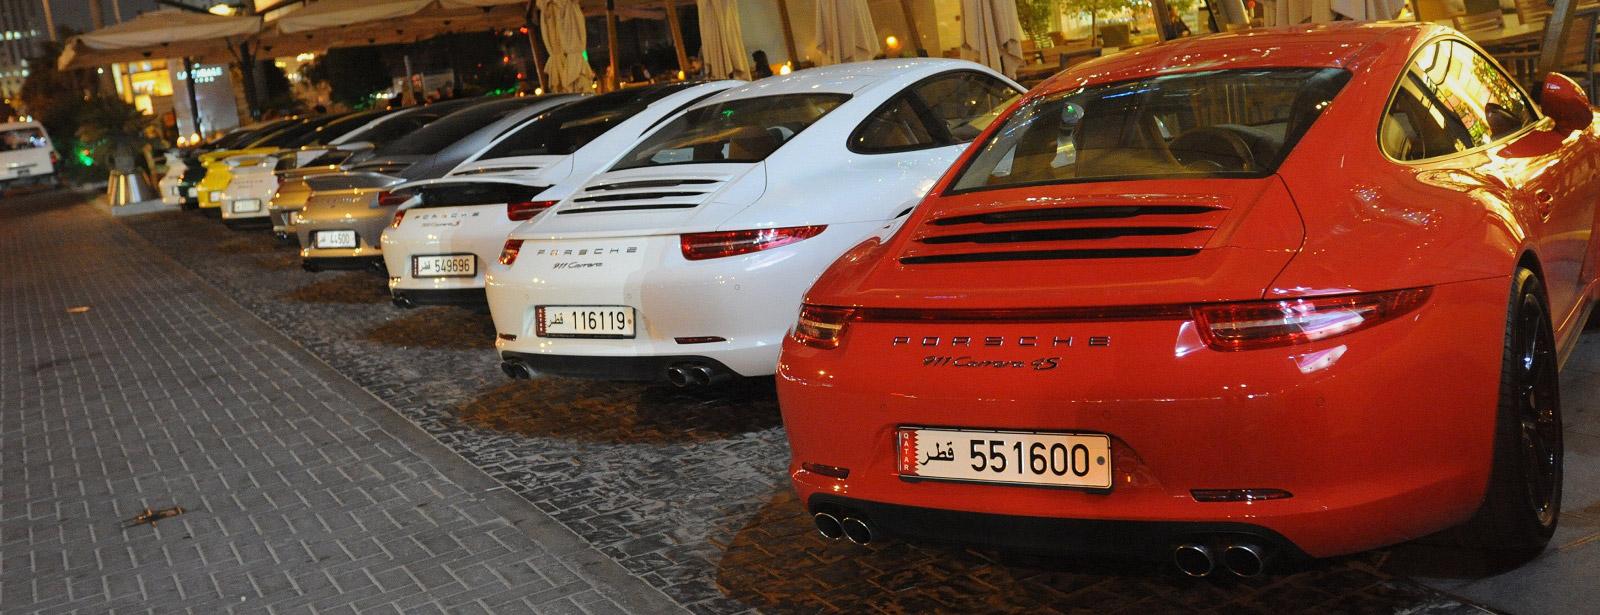 Porsche 911 Fans Group In Qatar Porsche Middle East